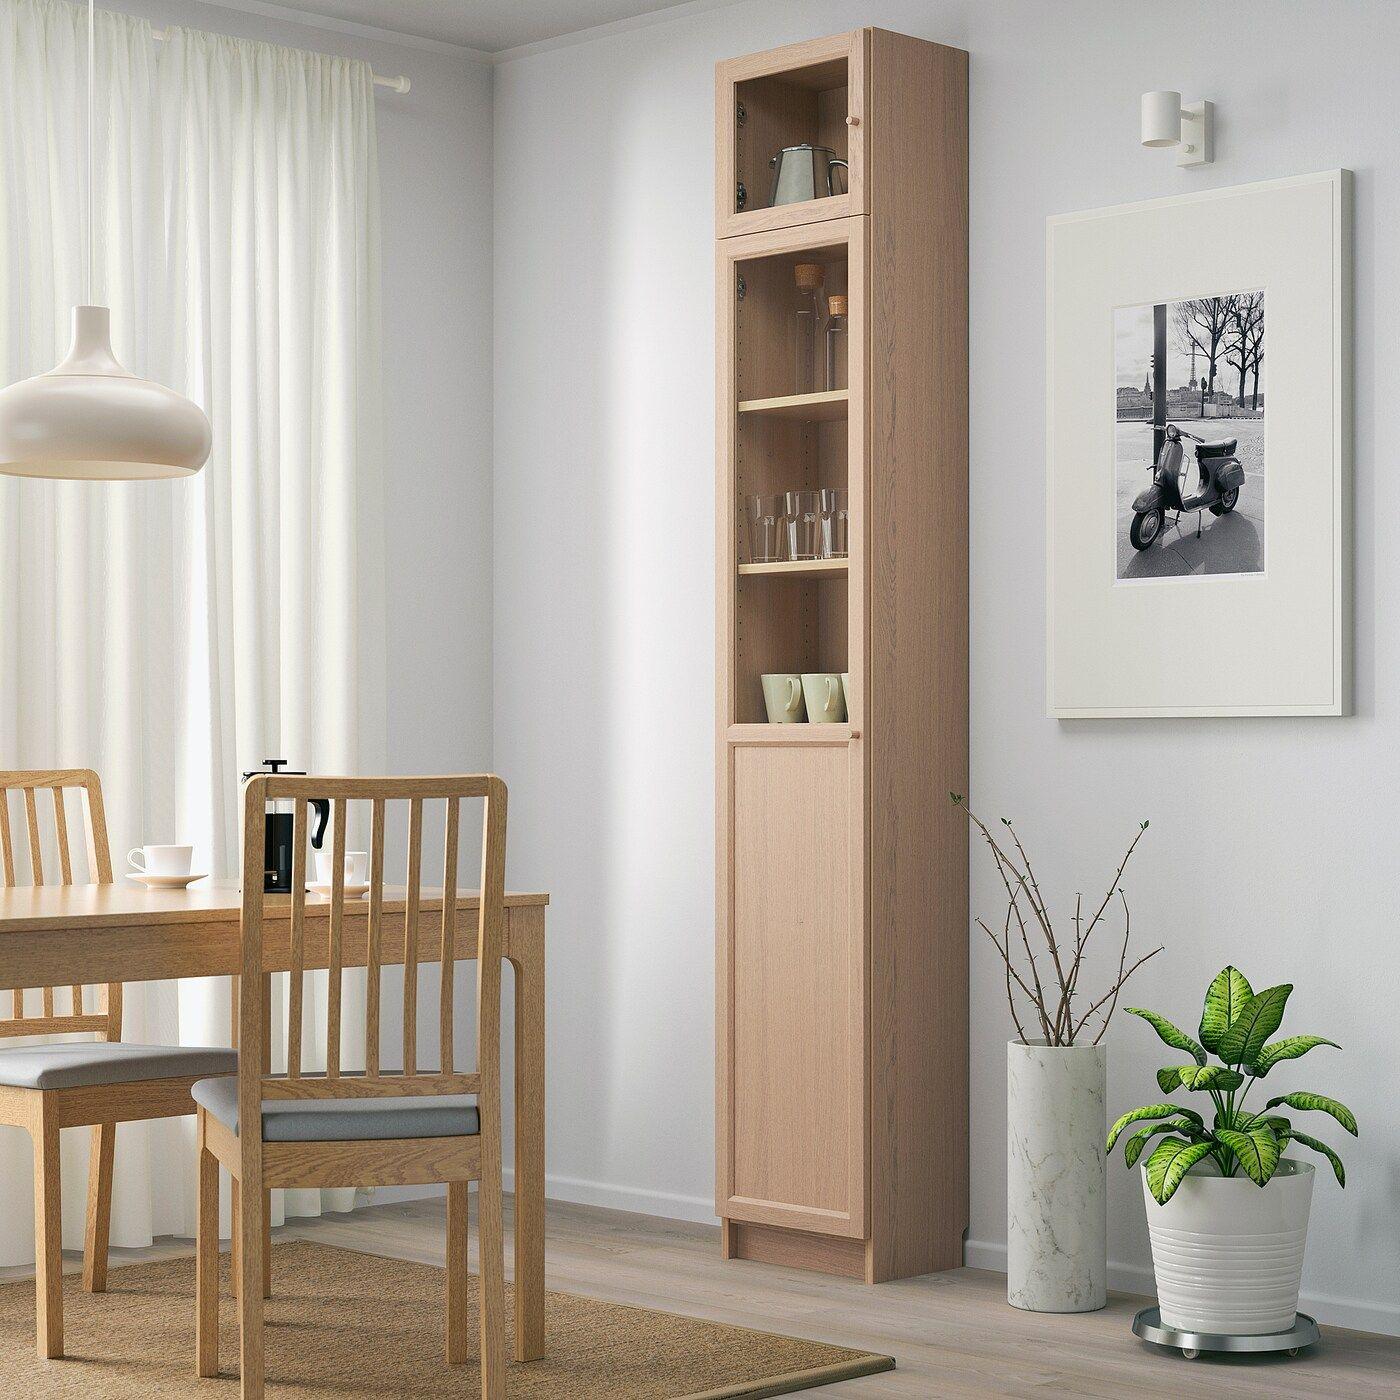 IKEA BILLY / OXBERG Bookshelf + Aufs / Panel- / Vitrtüren – Eic …